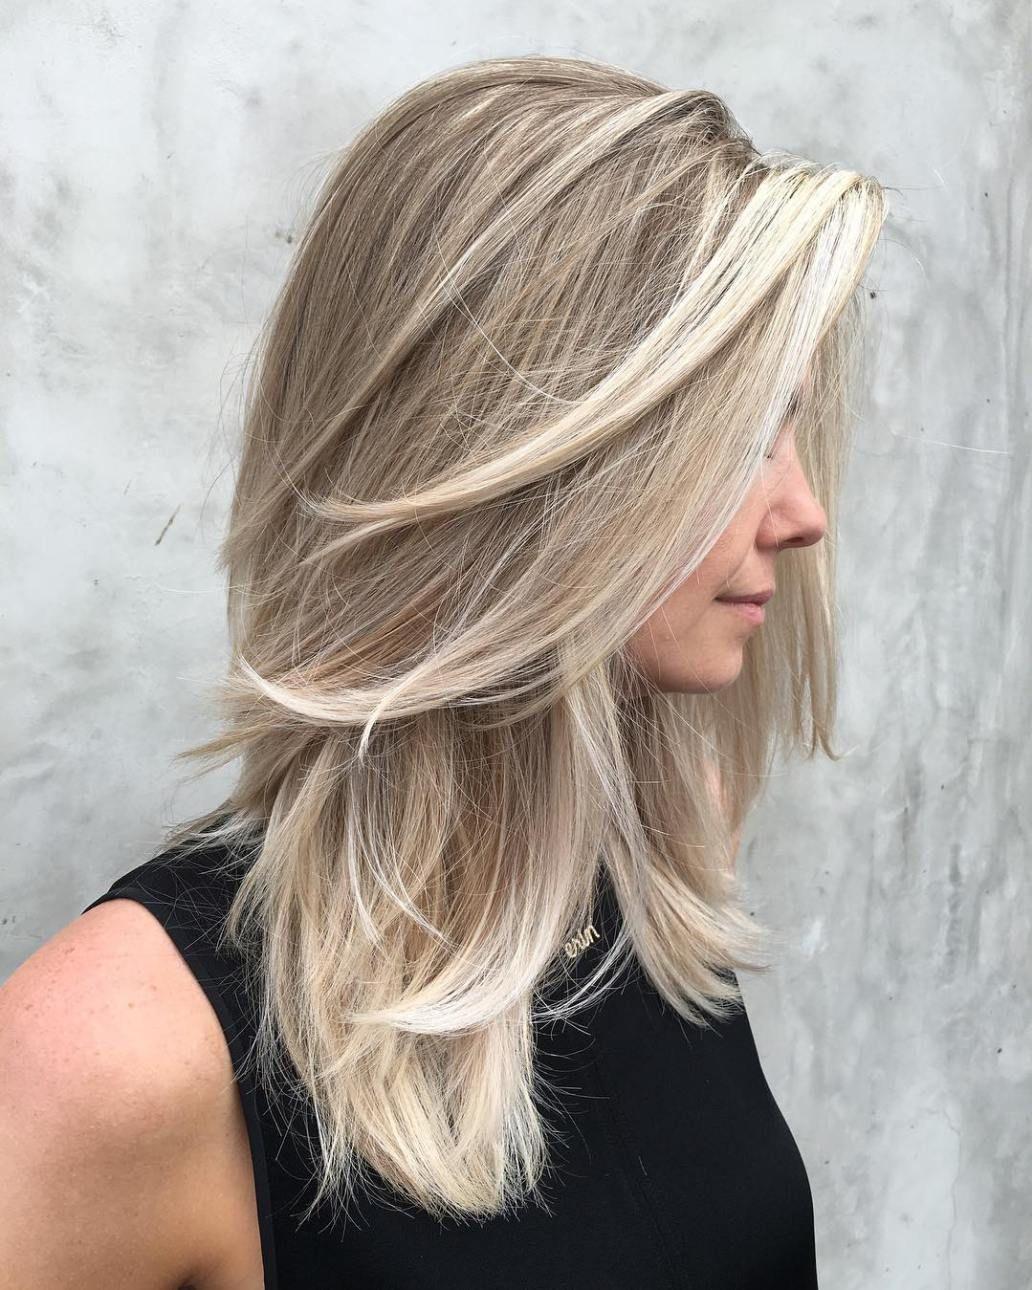 Medium Blonde Hairstyles 20 Beautiful Blonde Hairstyles To Play Around With  Medium Ash